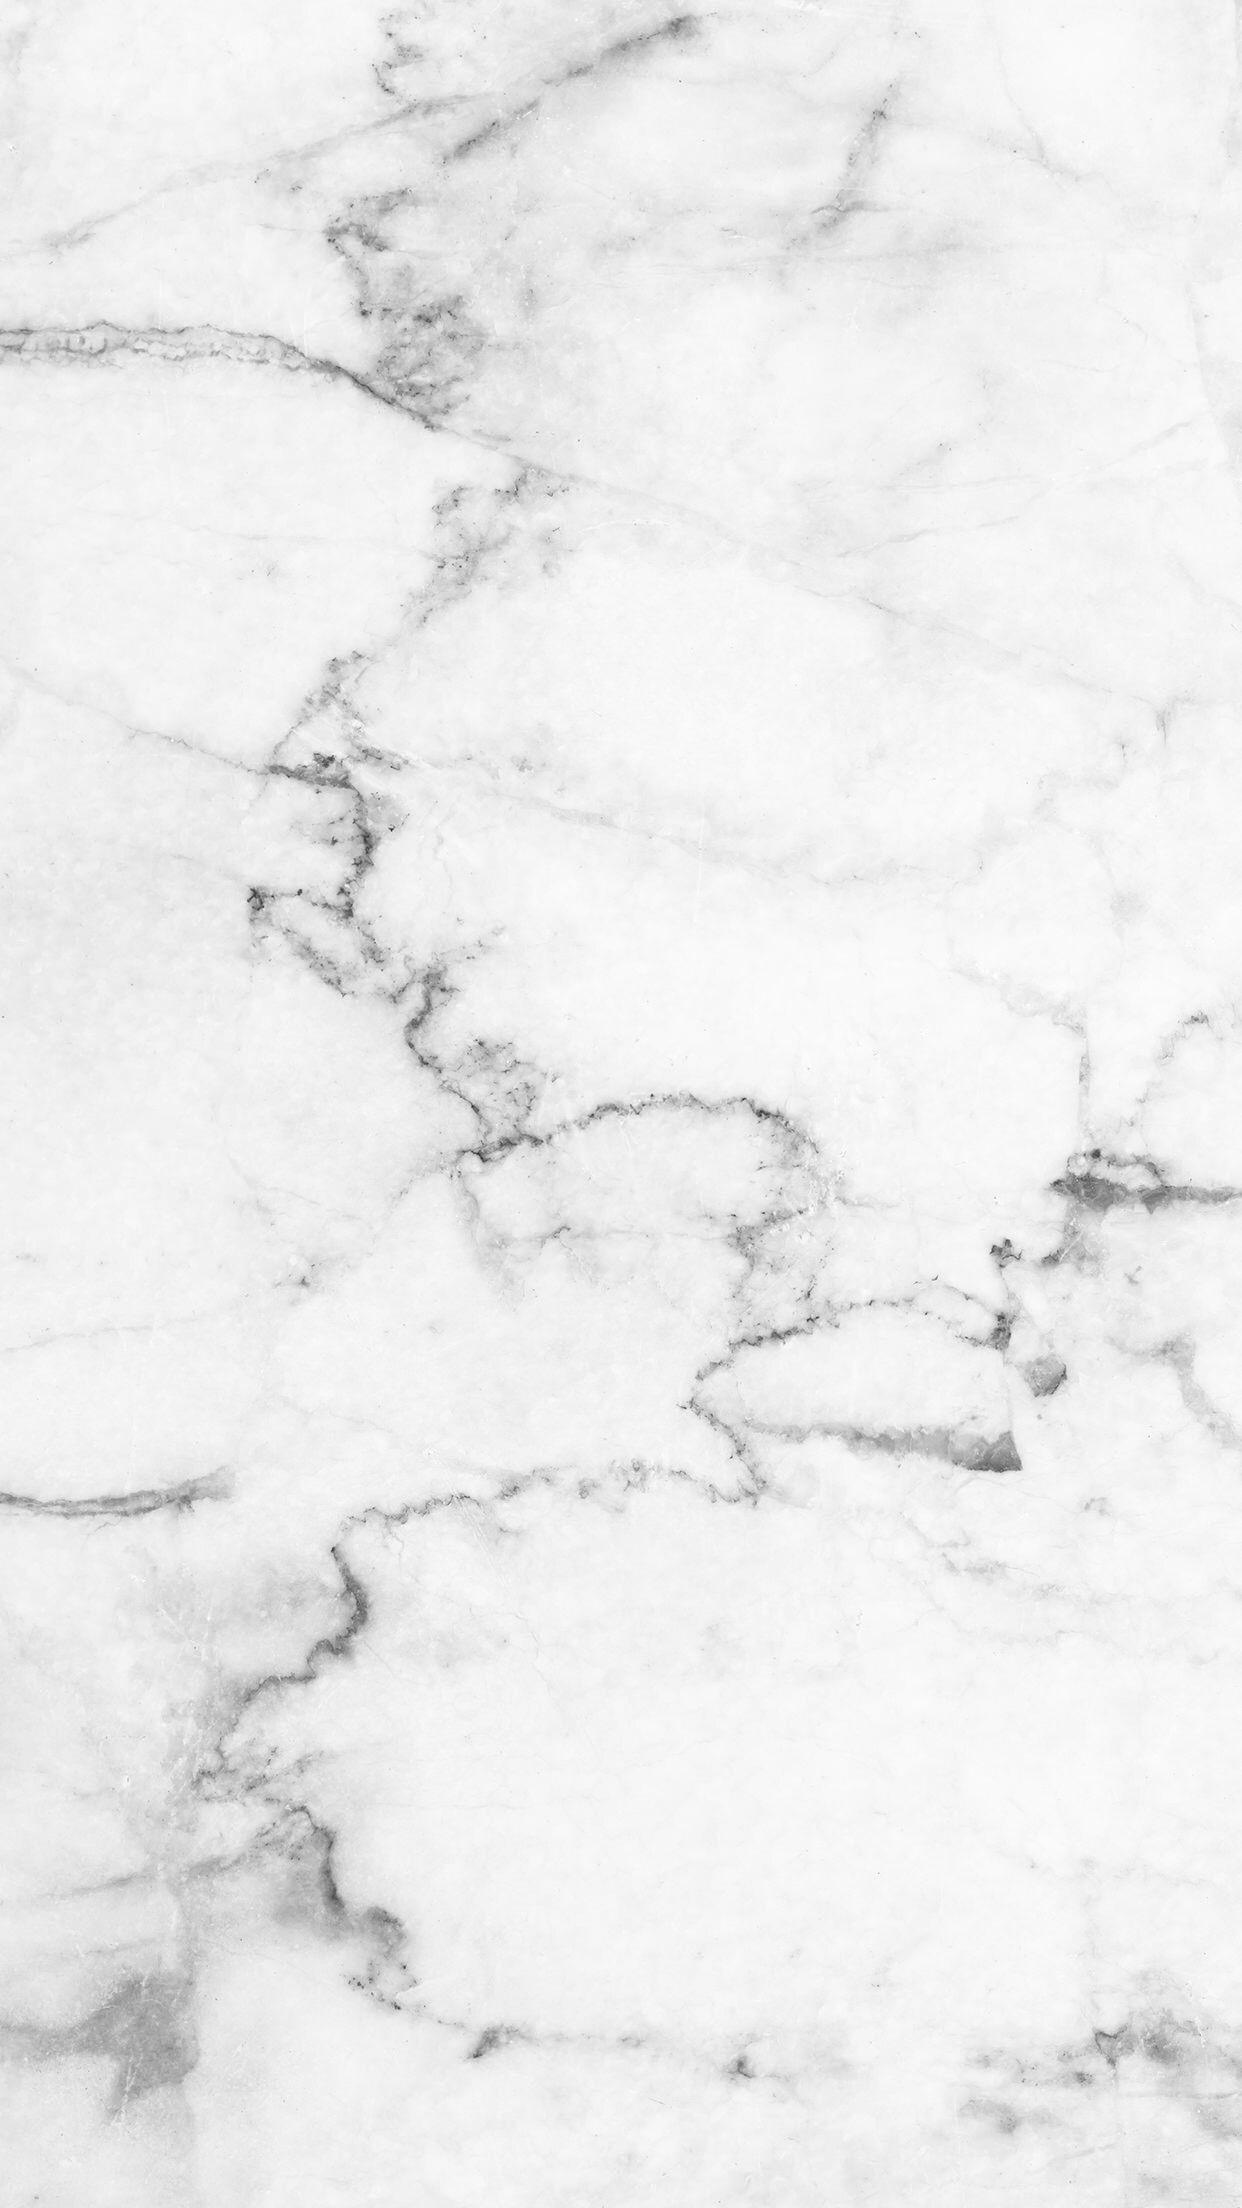 Popular Wallpaper Marble Artsy - 08472db14e204d2b4b311e894b0122aa  Trends_813343.jpg